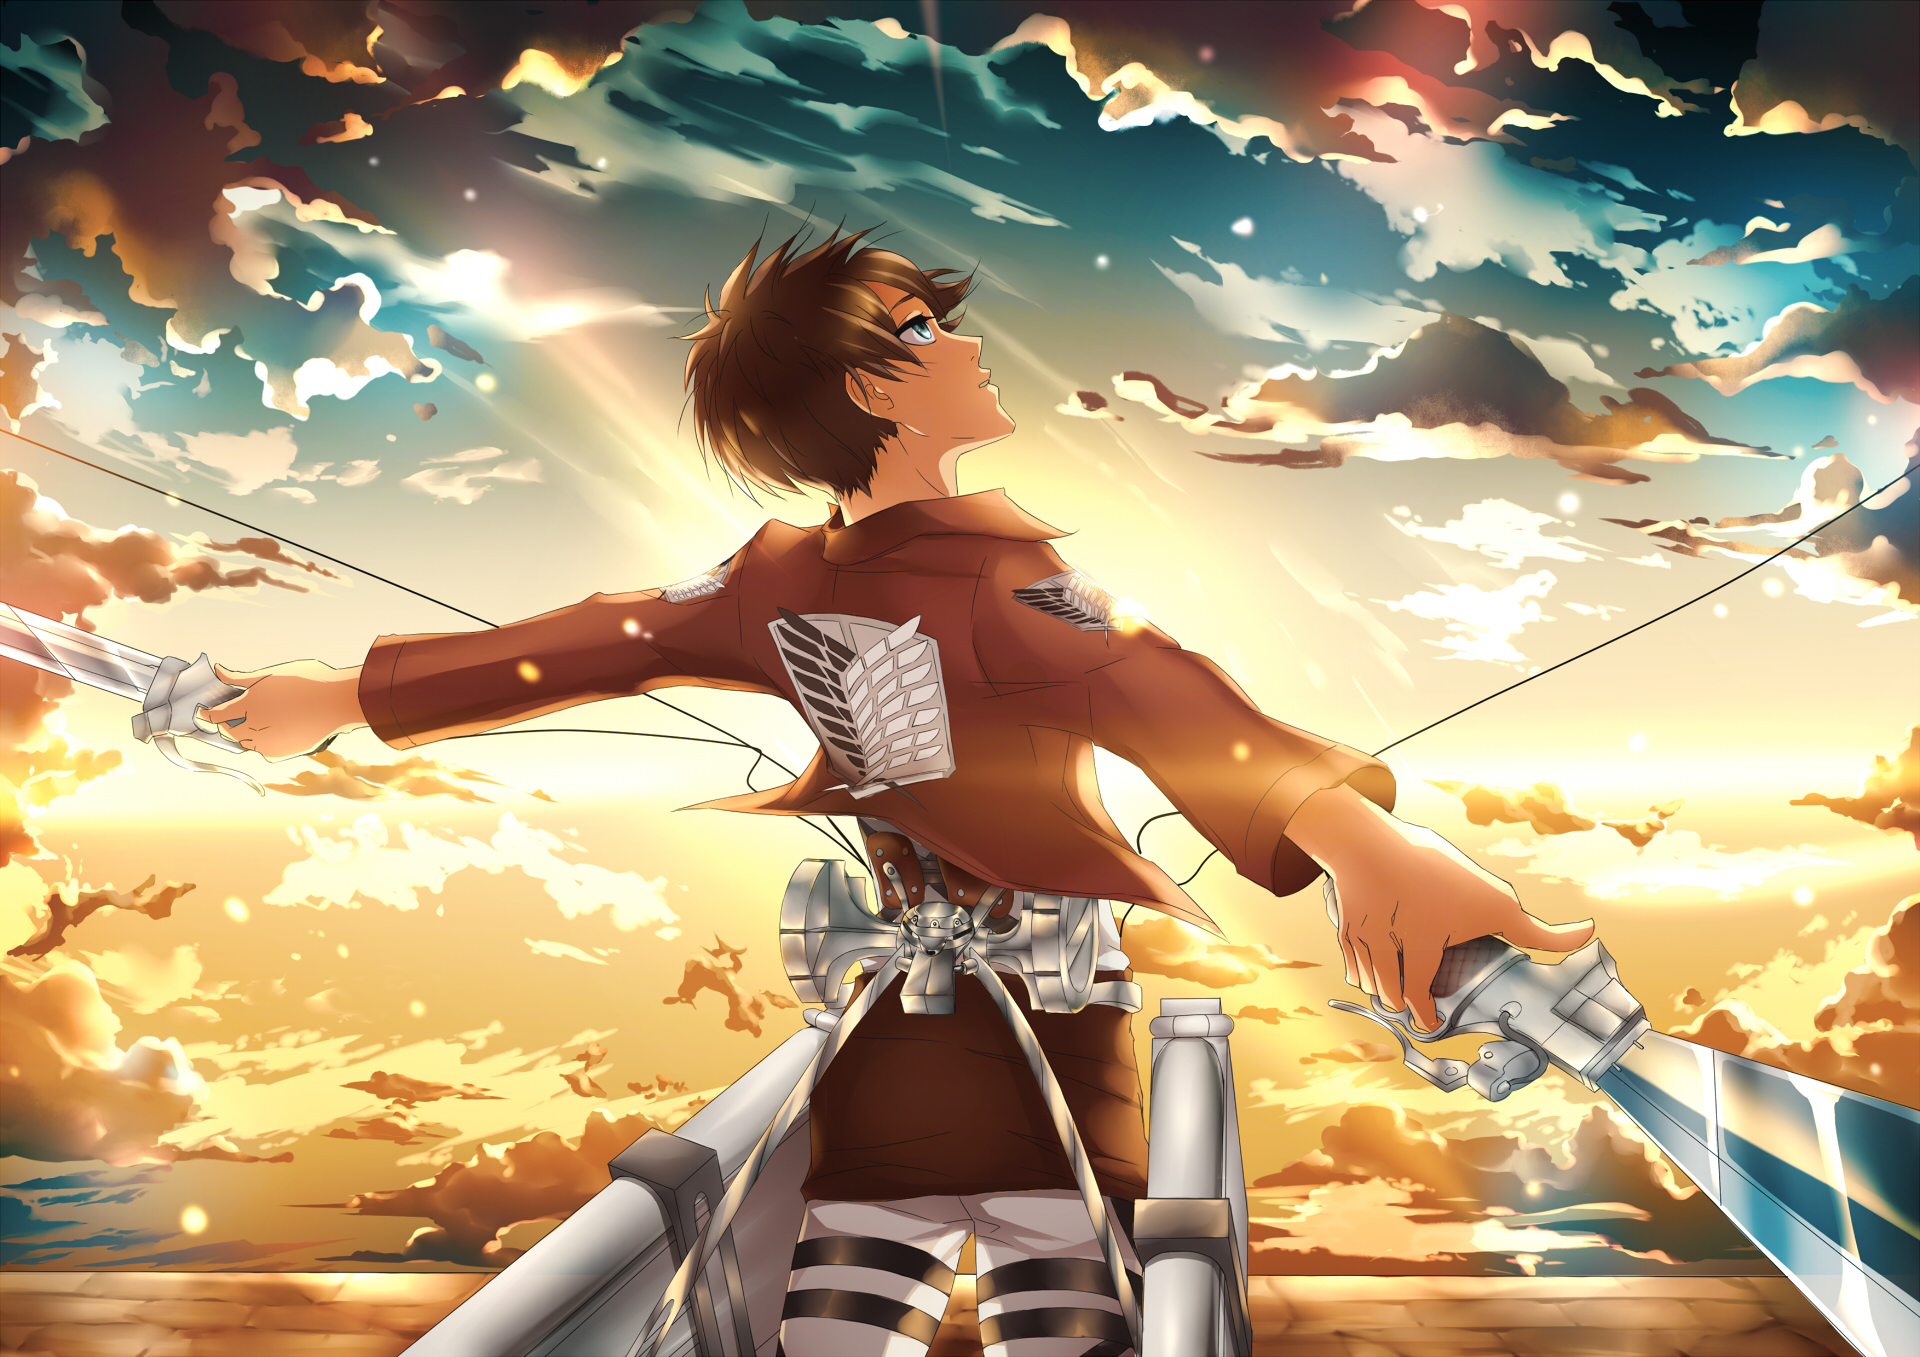 shingeki no kyojin, eren jaeger, man Wallpaper, HD Anime ...